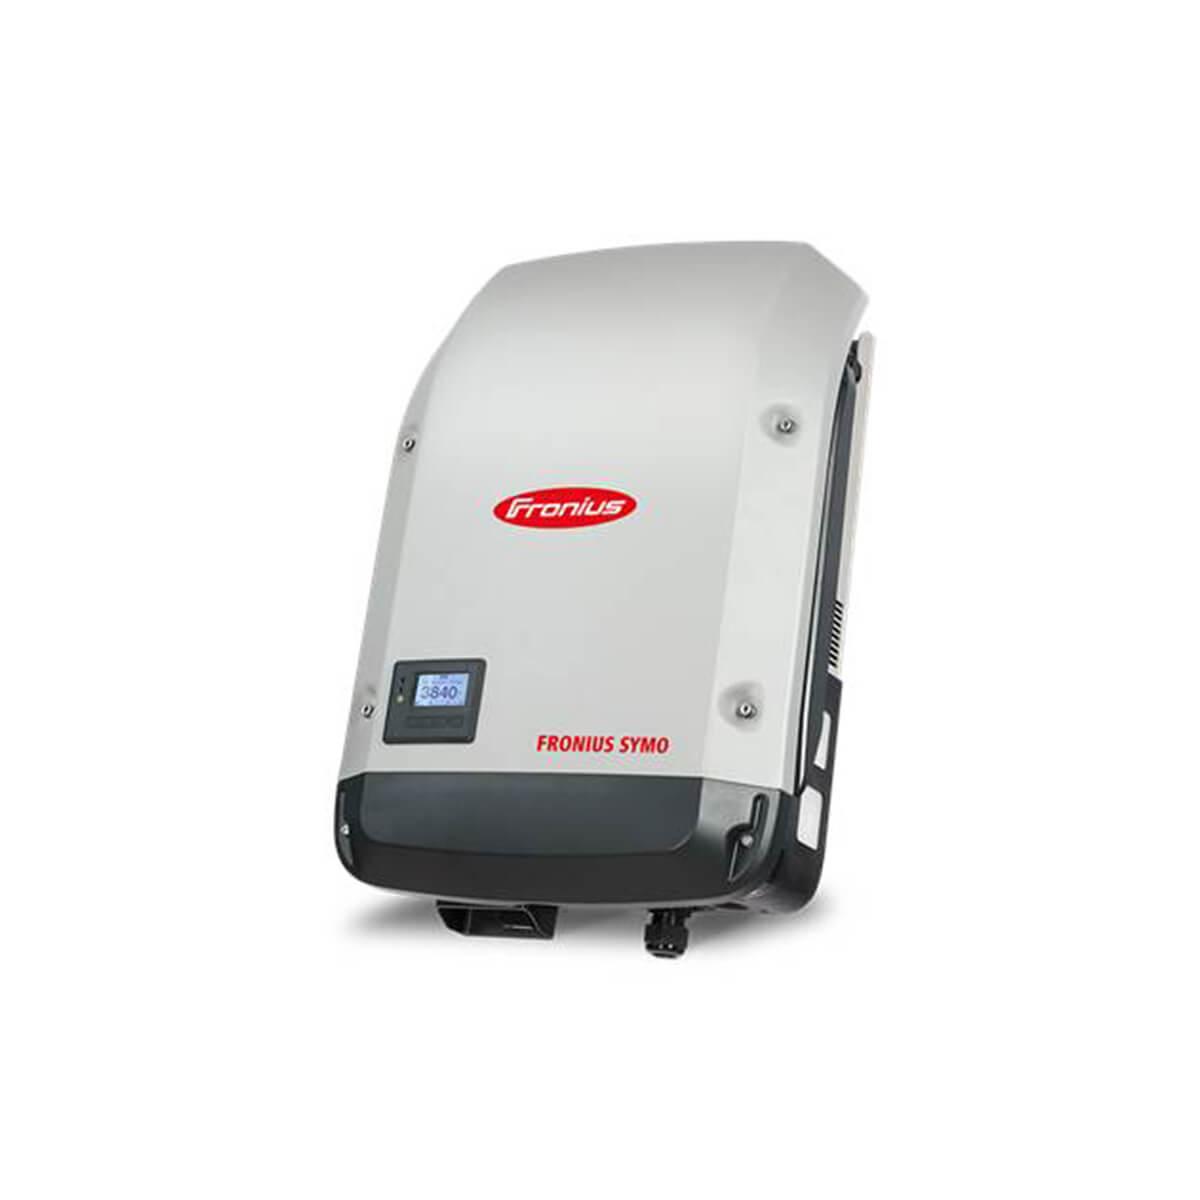 fronius 3kW inverter, fronius symo 3kW inverter, fronius symo 3.0-3-s inverter, fronius symo 3.0-3-s, fronius symo 3 kW